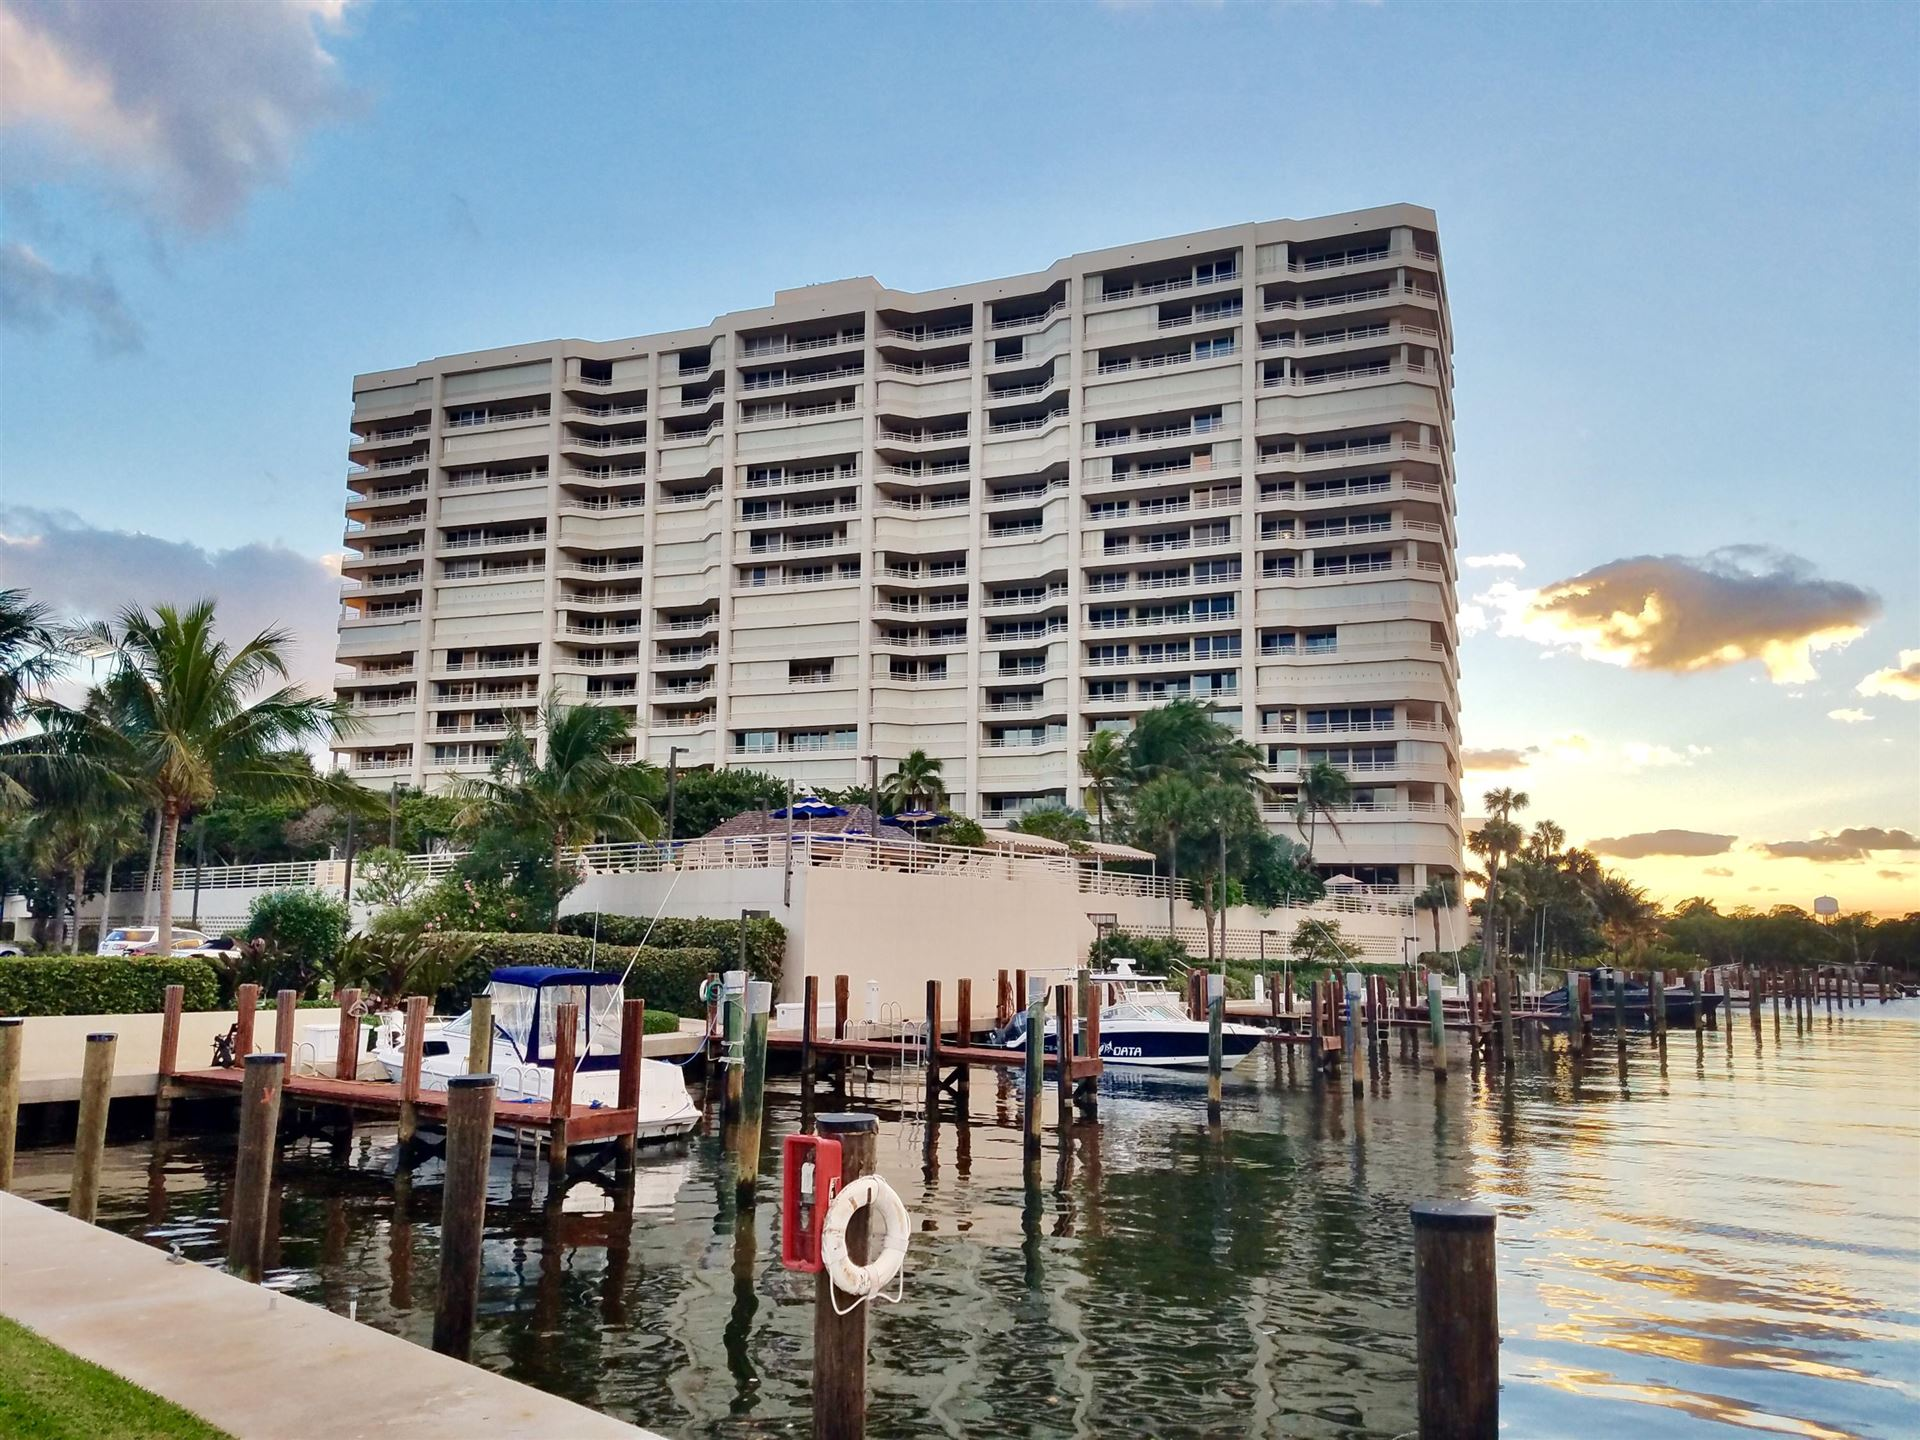 4101 N Ocean Boulevard #D-1008, Boca Raton, FL 33431 - #: RX-10601641